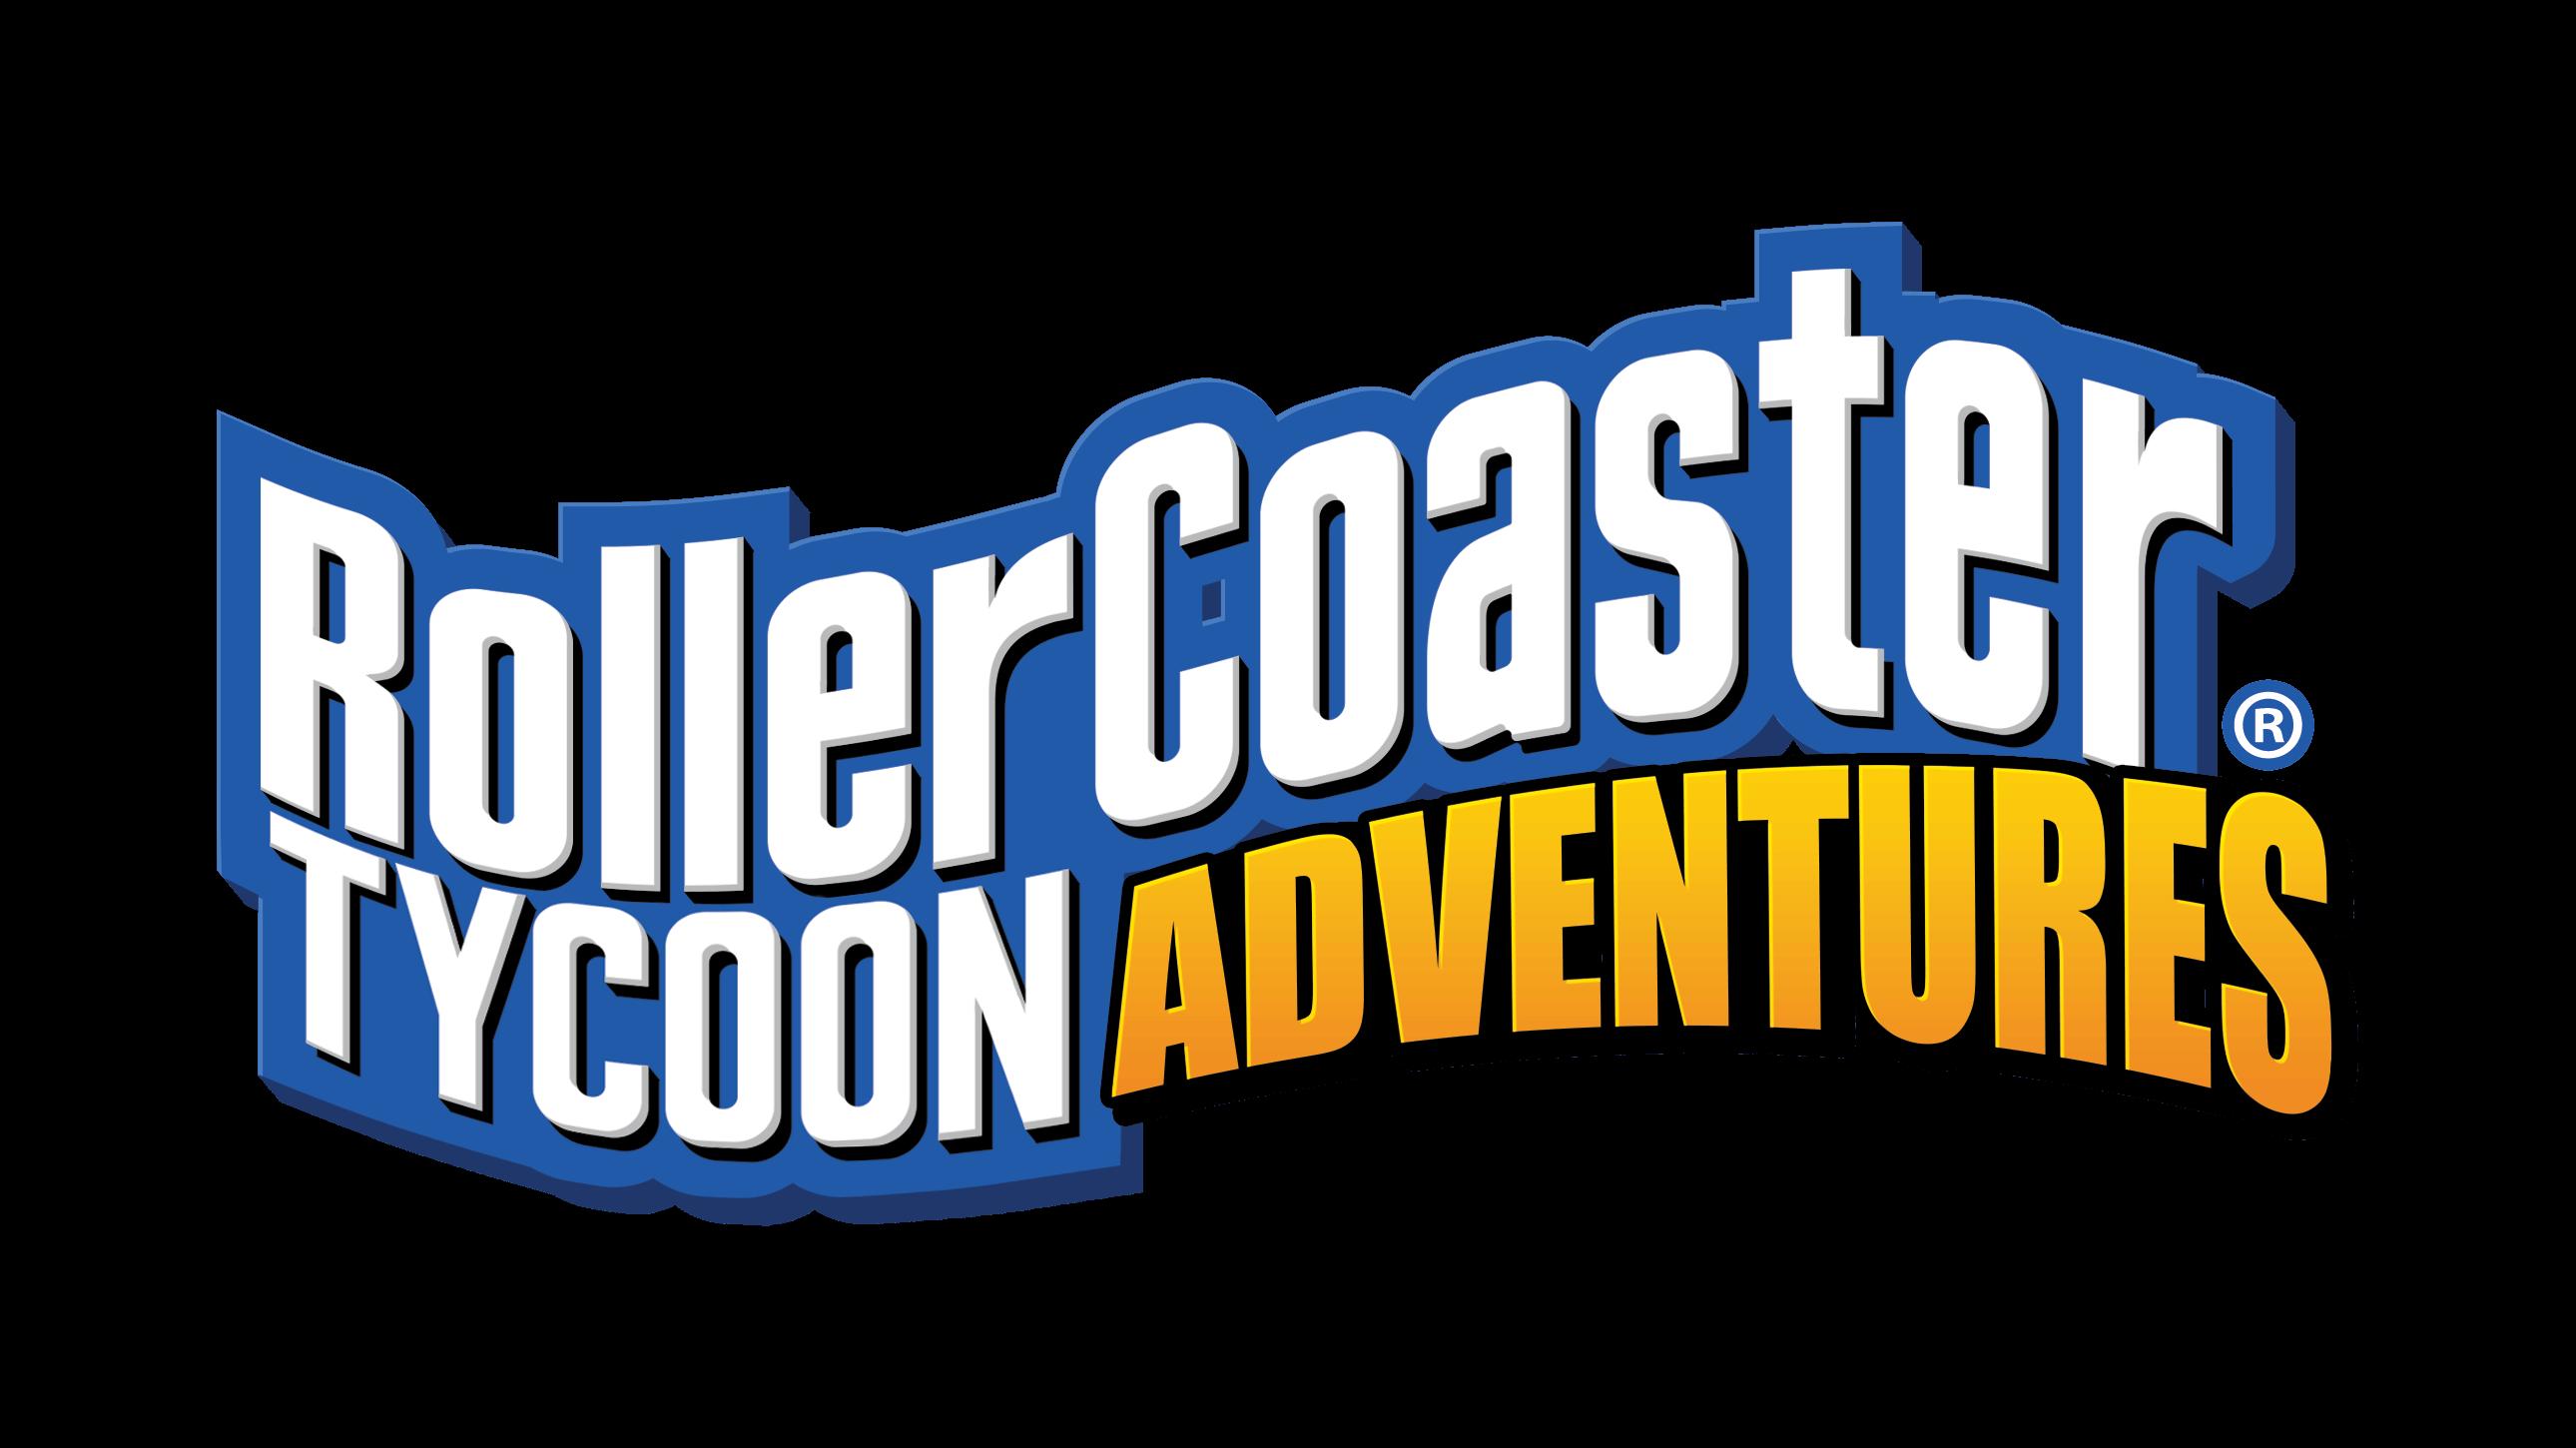 RollerCoaster Tycoon Adventures